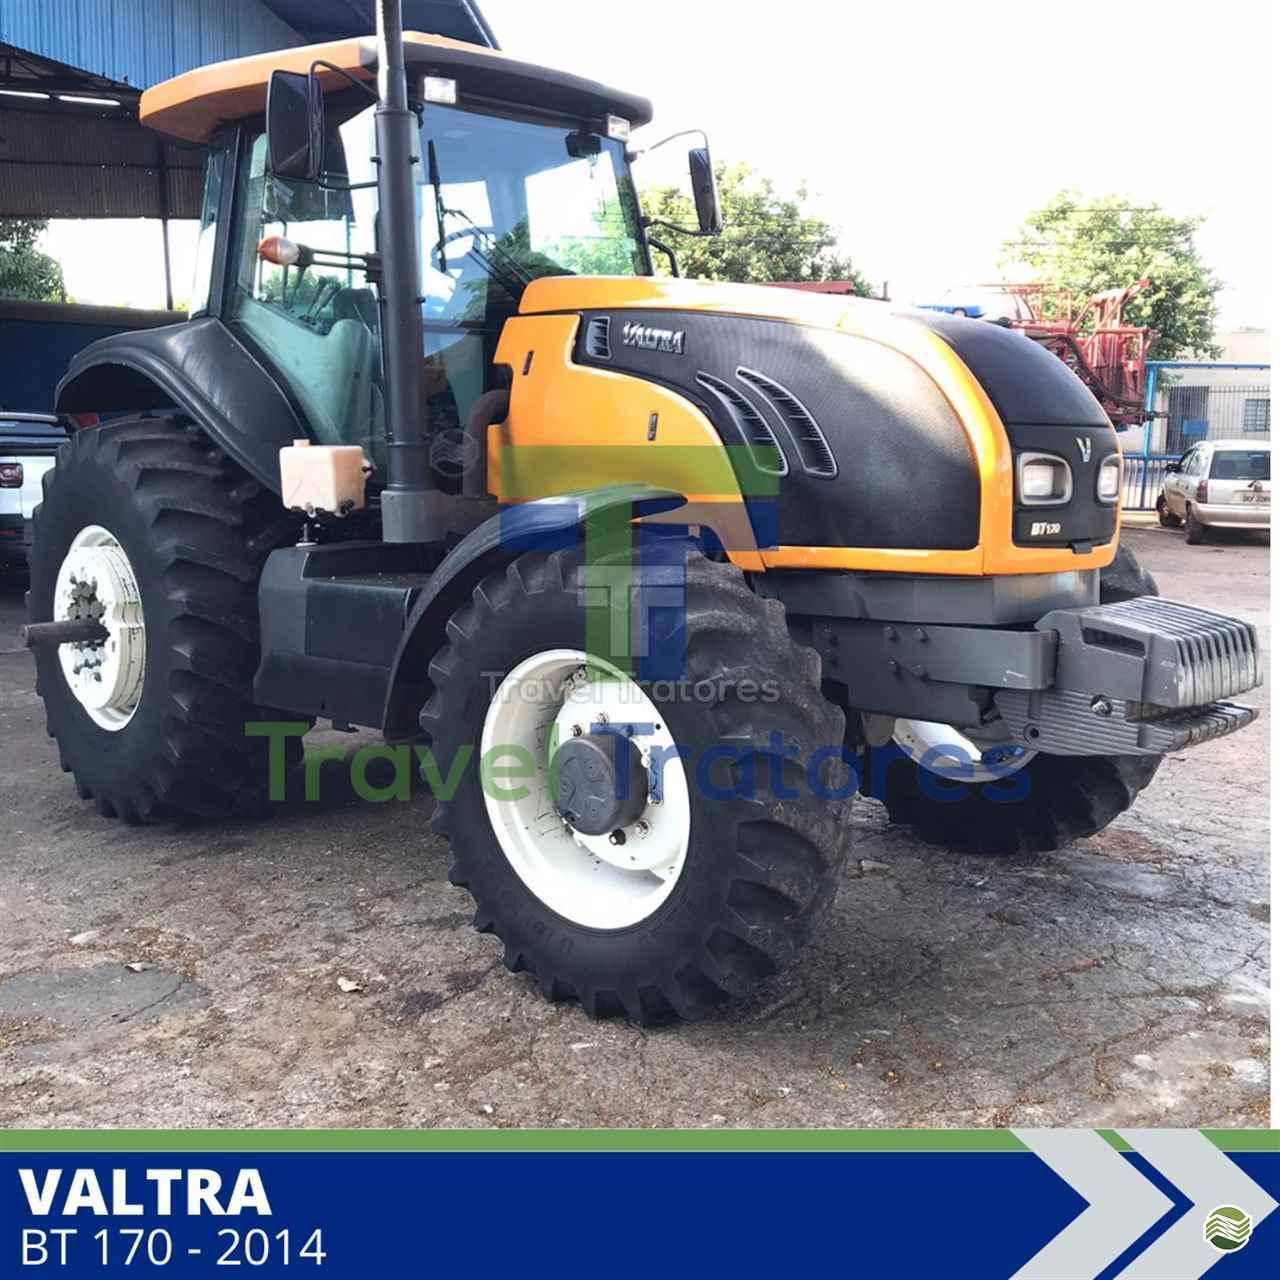 VALTRA BT 170 de Travel Máquinas Agrícolas - LONDRINA/PR